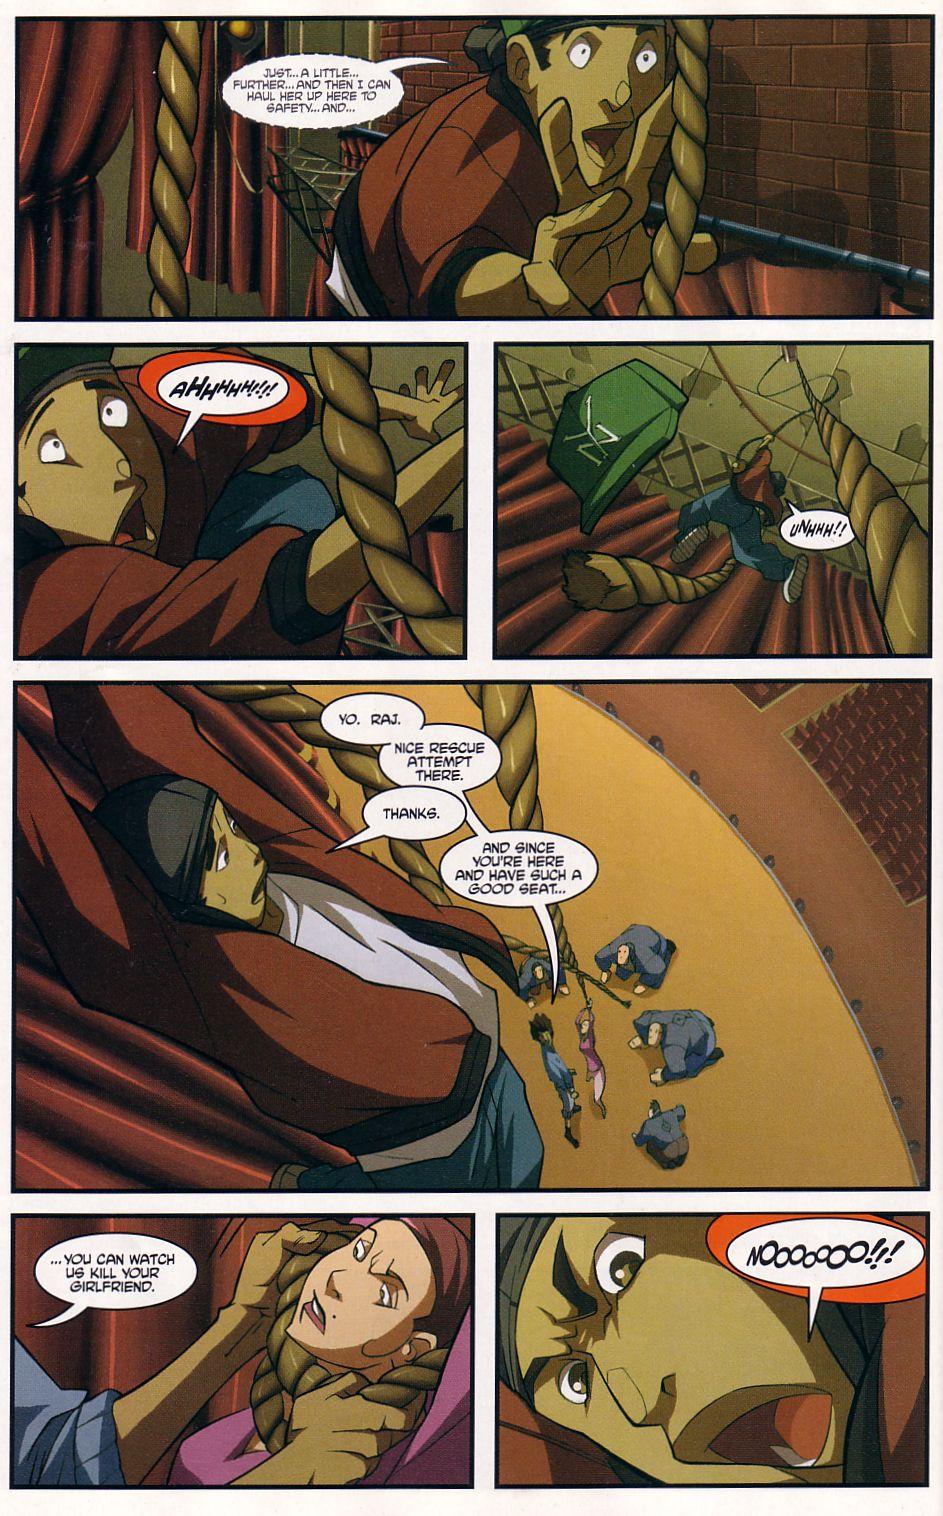 Teenage Mutant Ninja Turtles (2003) chap 7 pic 18